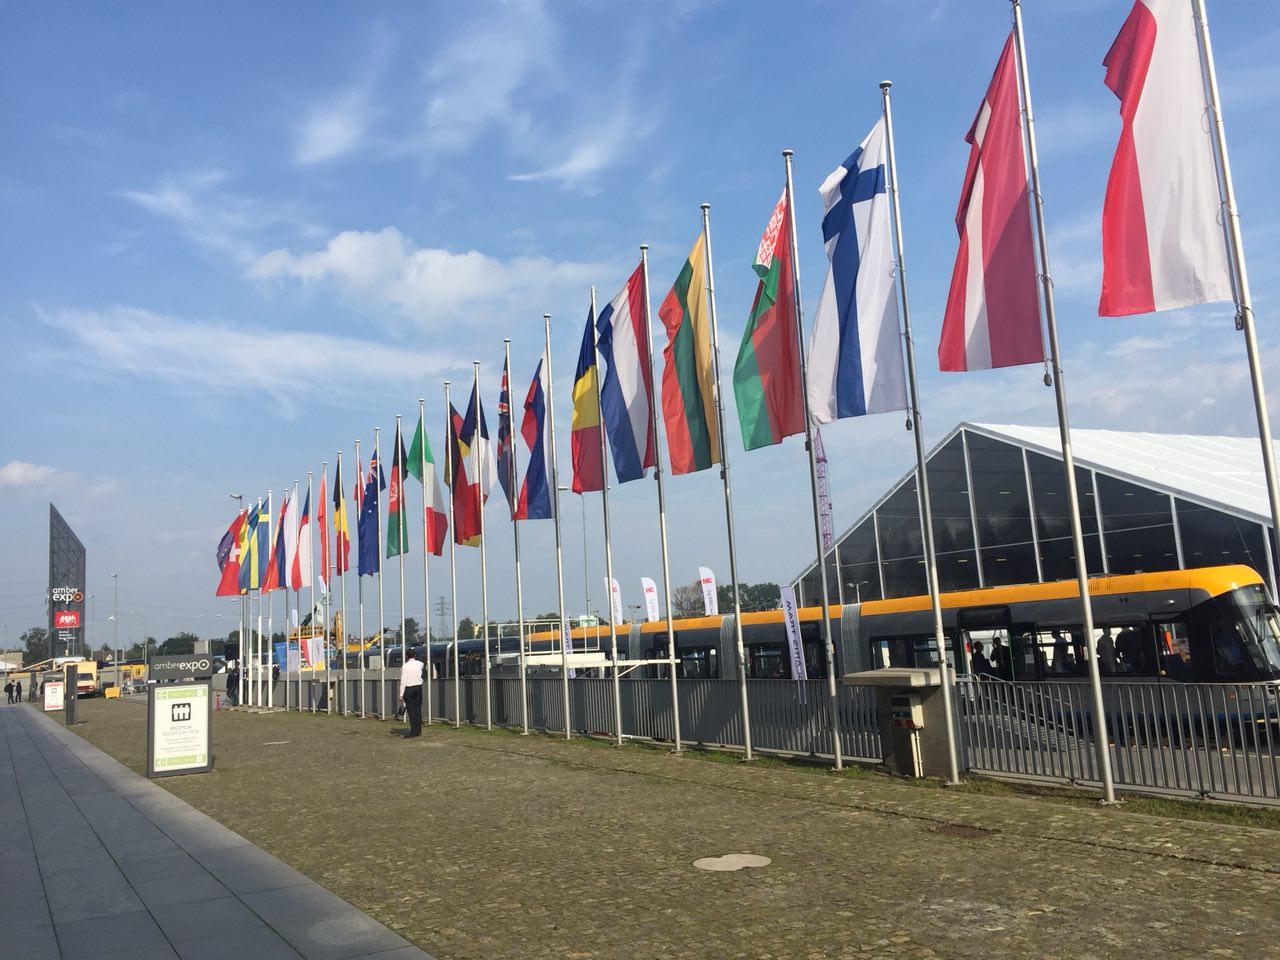 KZESO Took Part In The 12th TRAKO International Railway Fair – 2017 From September 26, 2017 To September 29, 2017